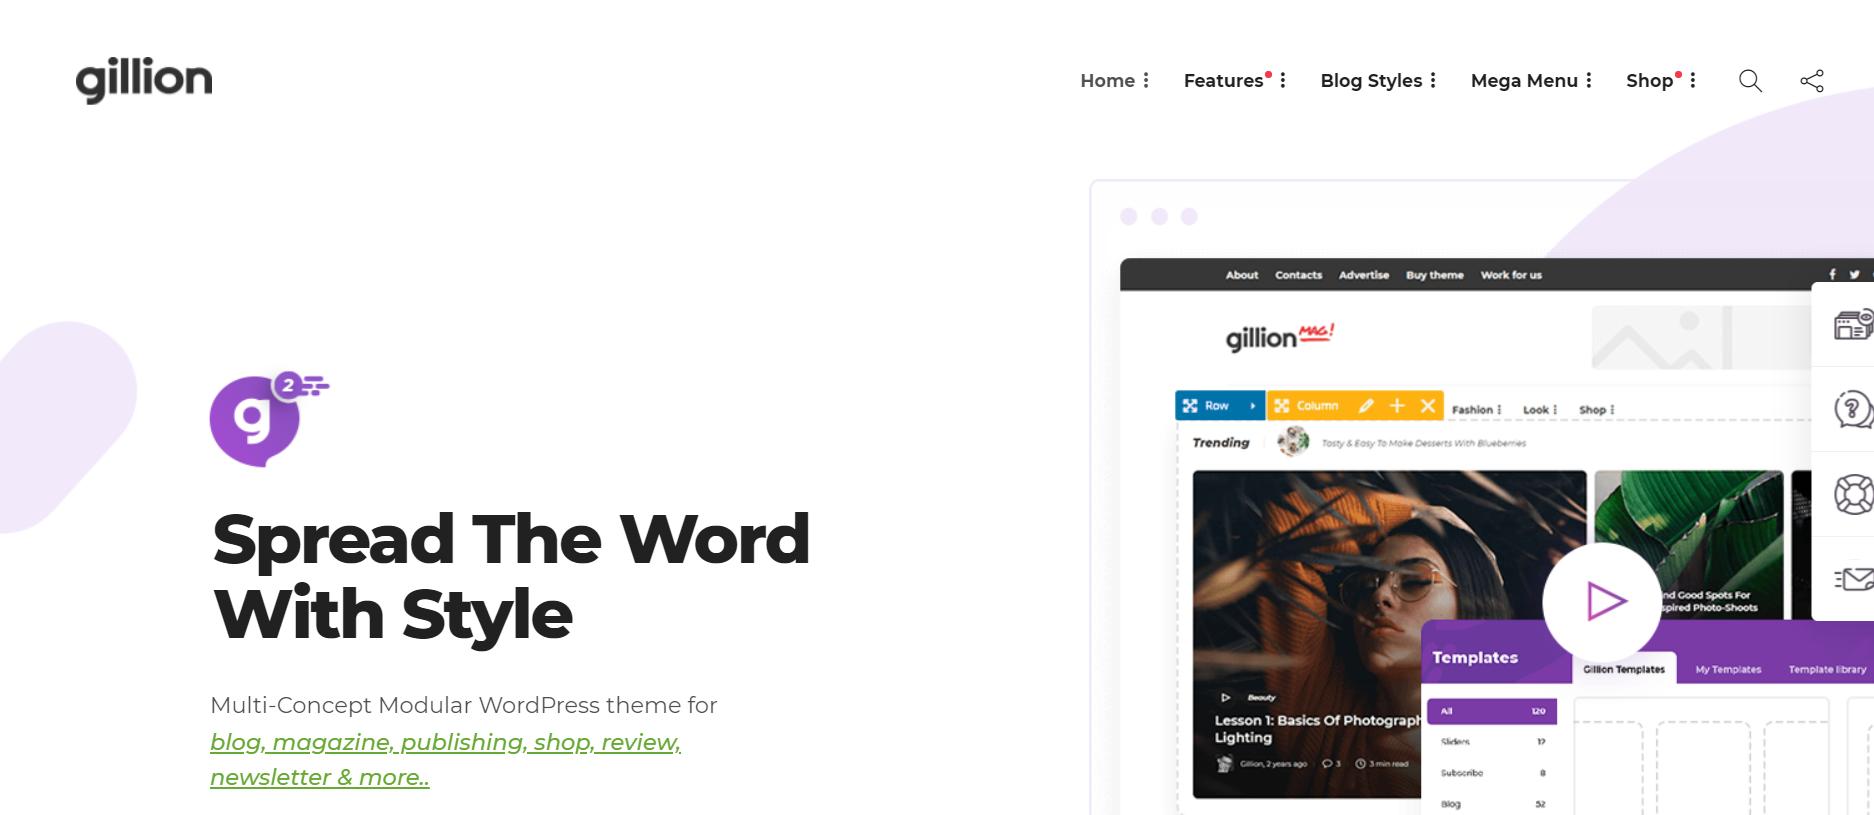 wordpress blogging themes